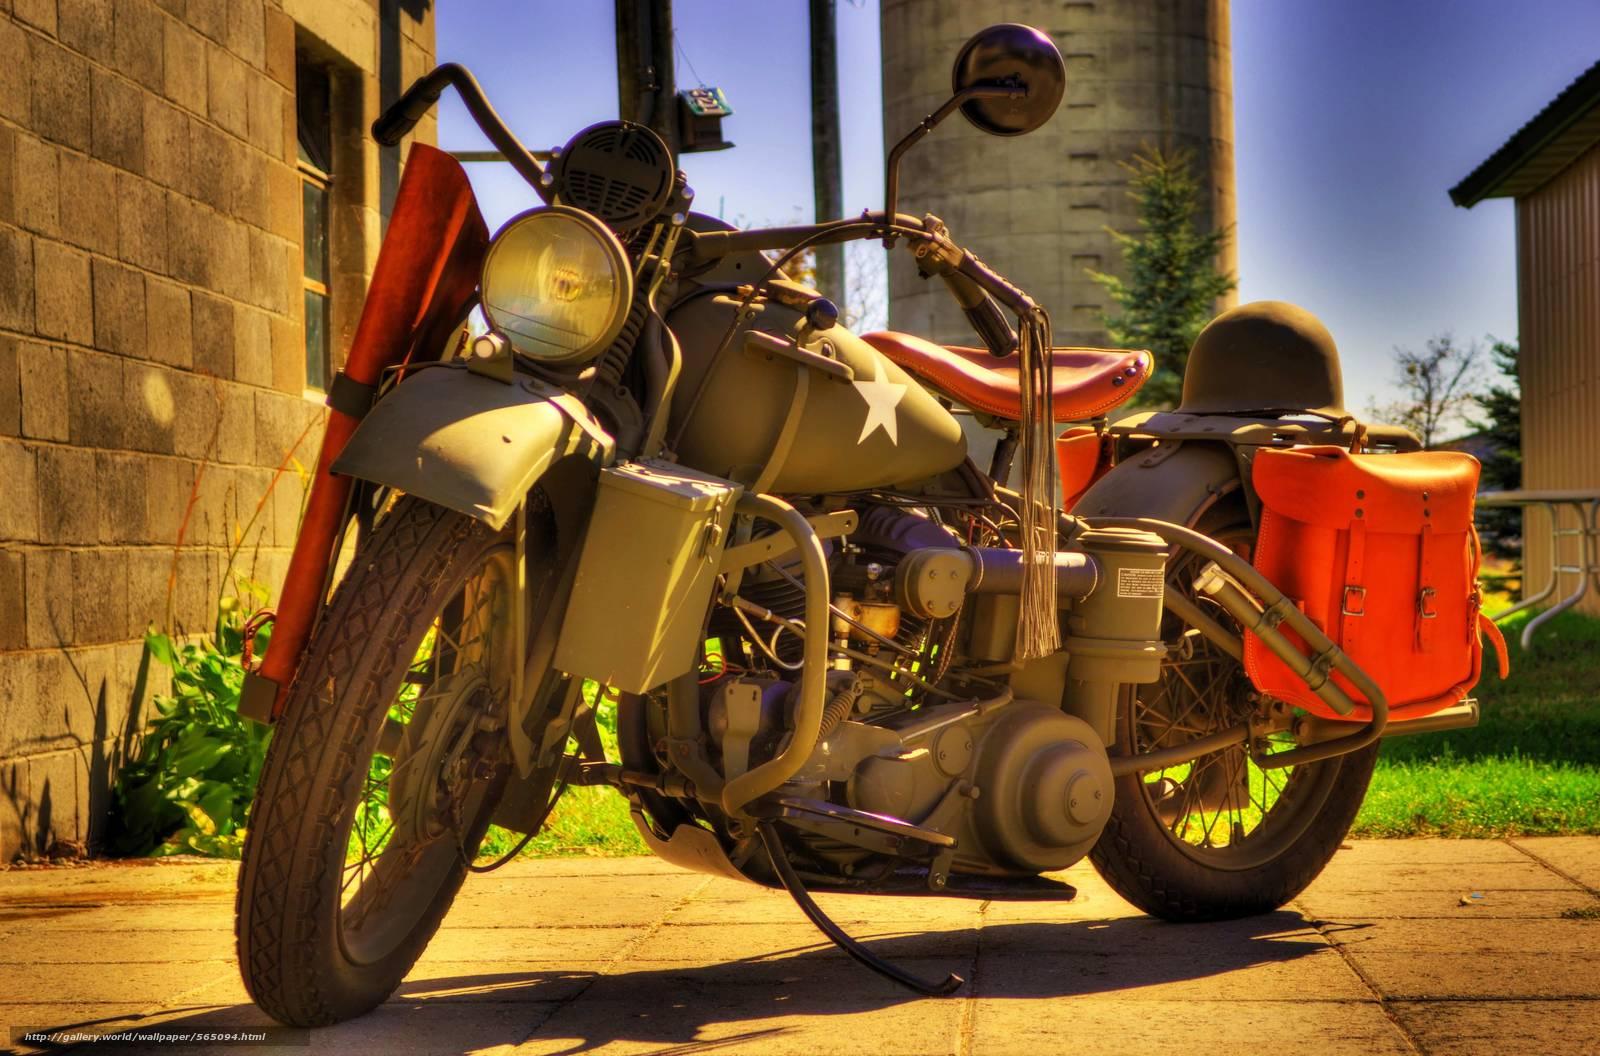 Download wallpaper times motorcycle helmet motorcycles 1600x1056